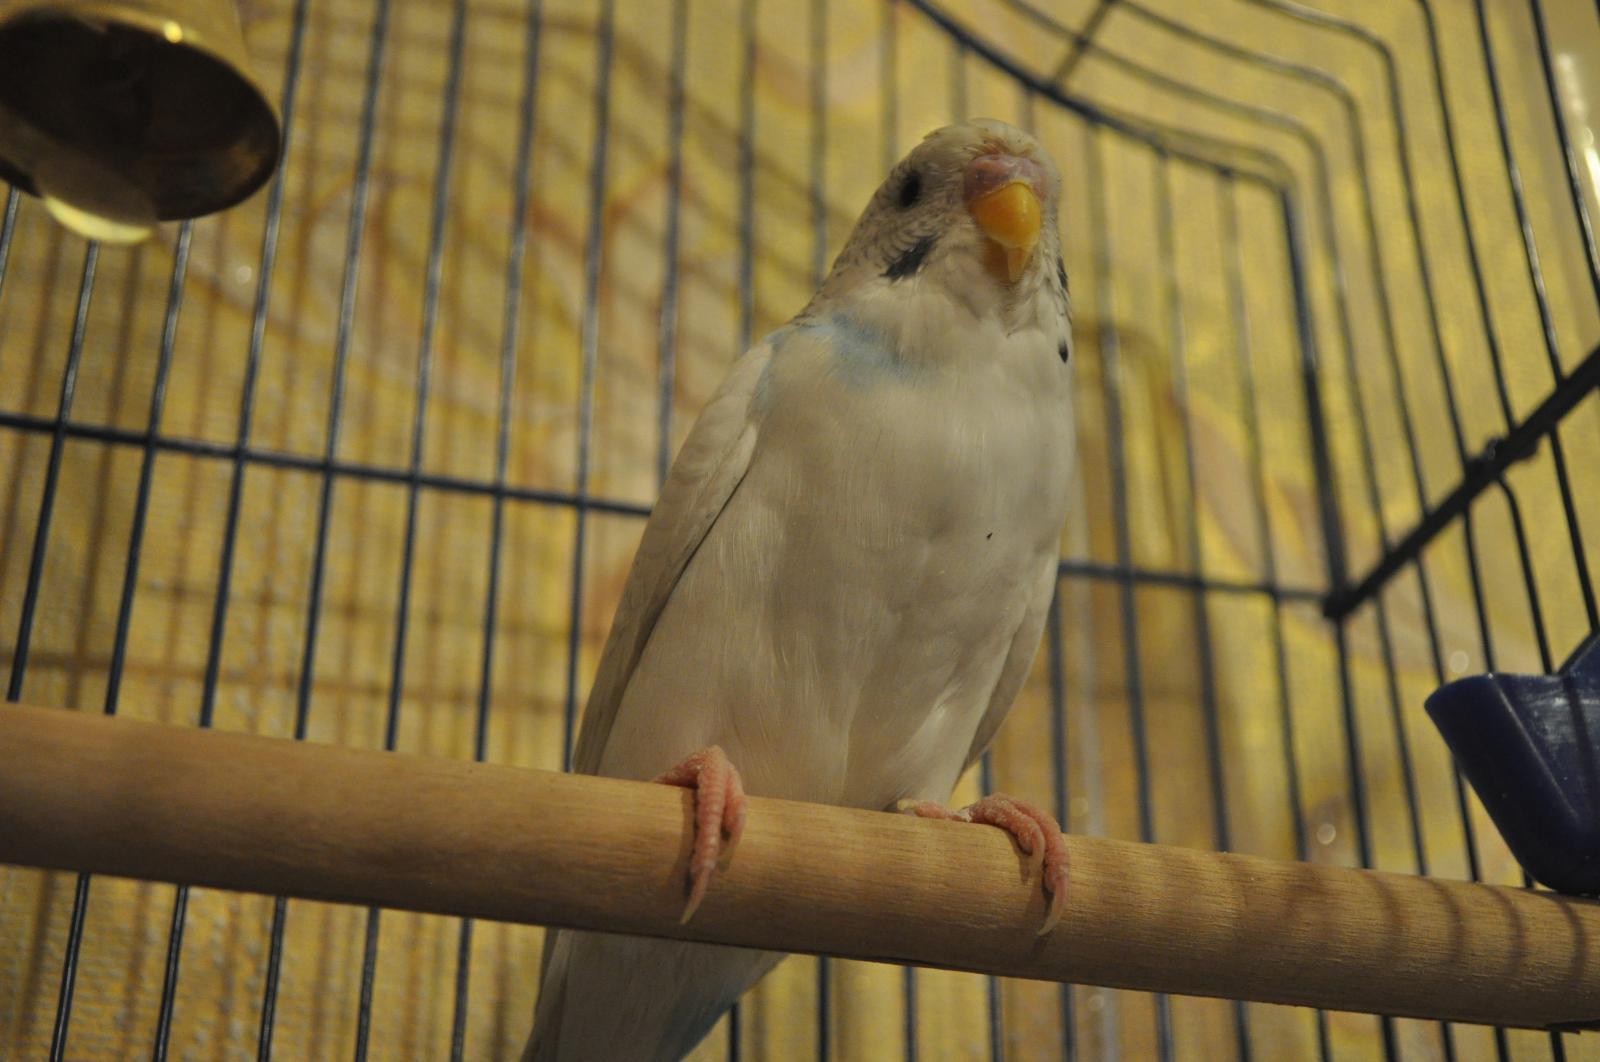 птиц - DSC_1283.JPG